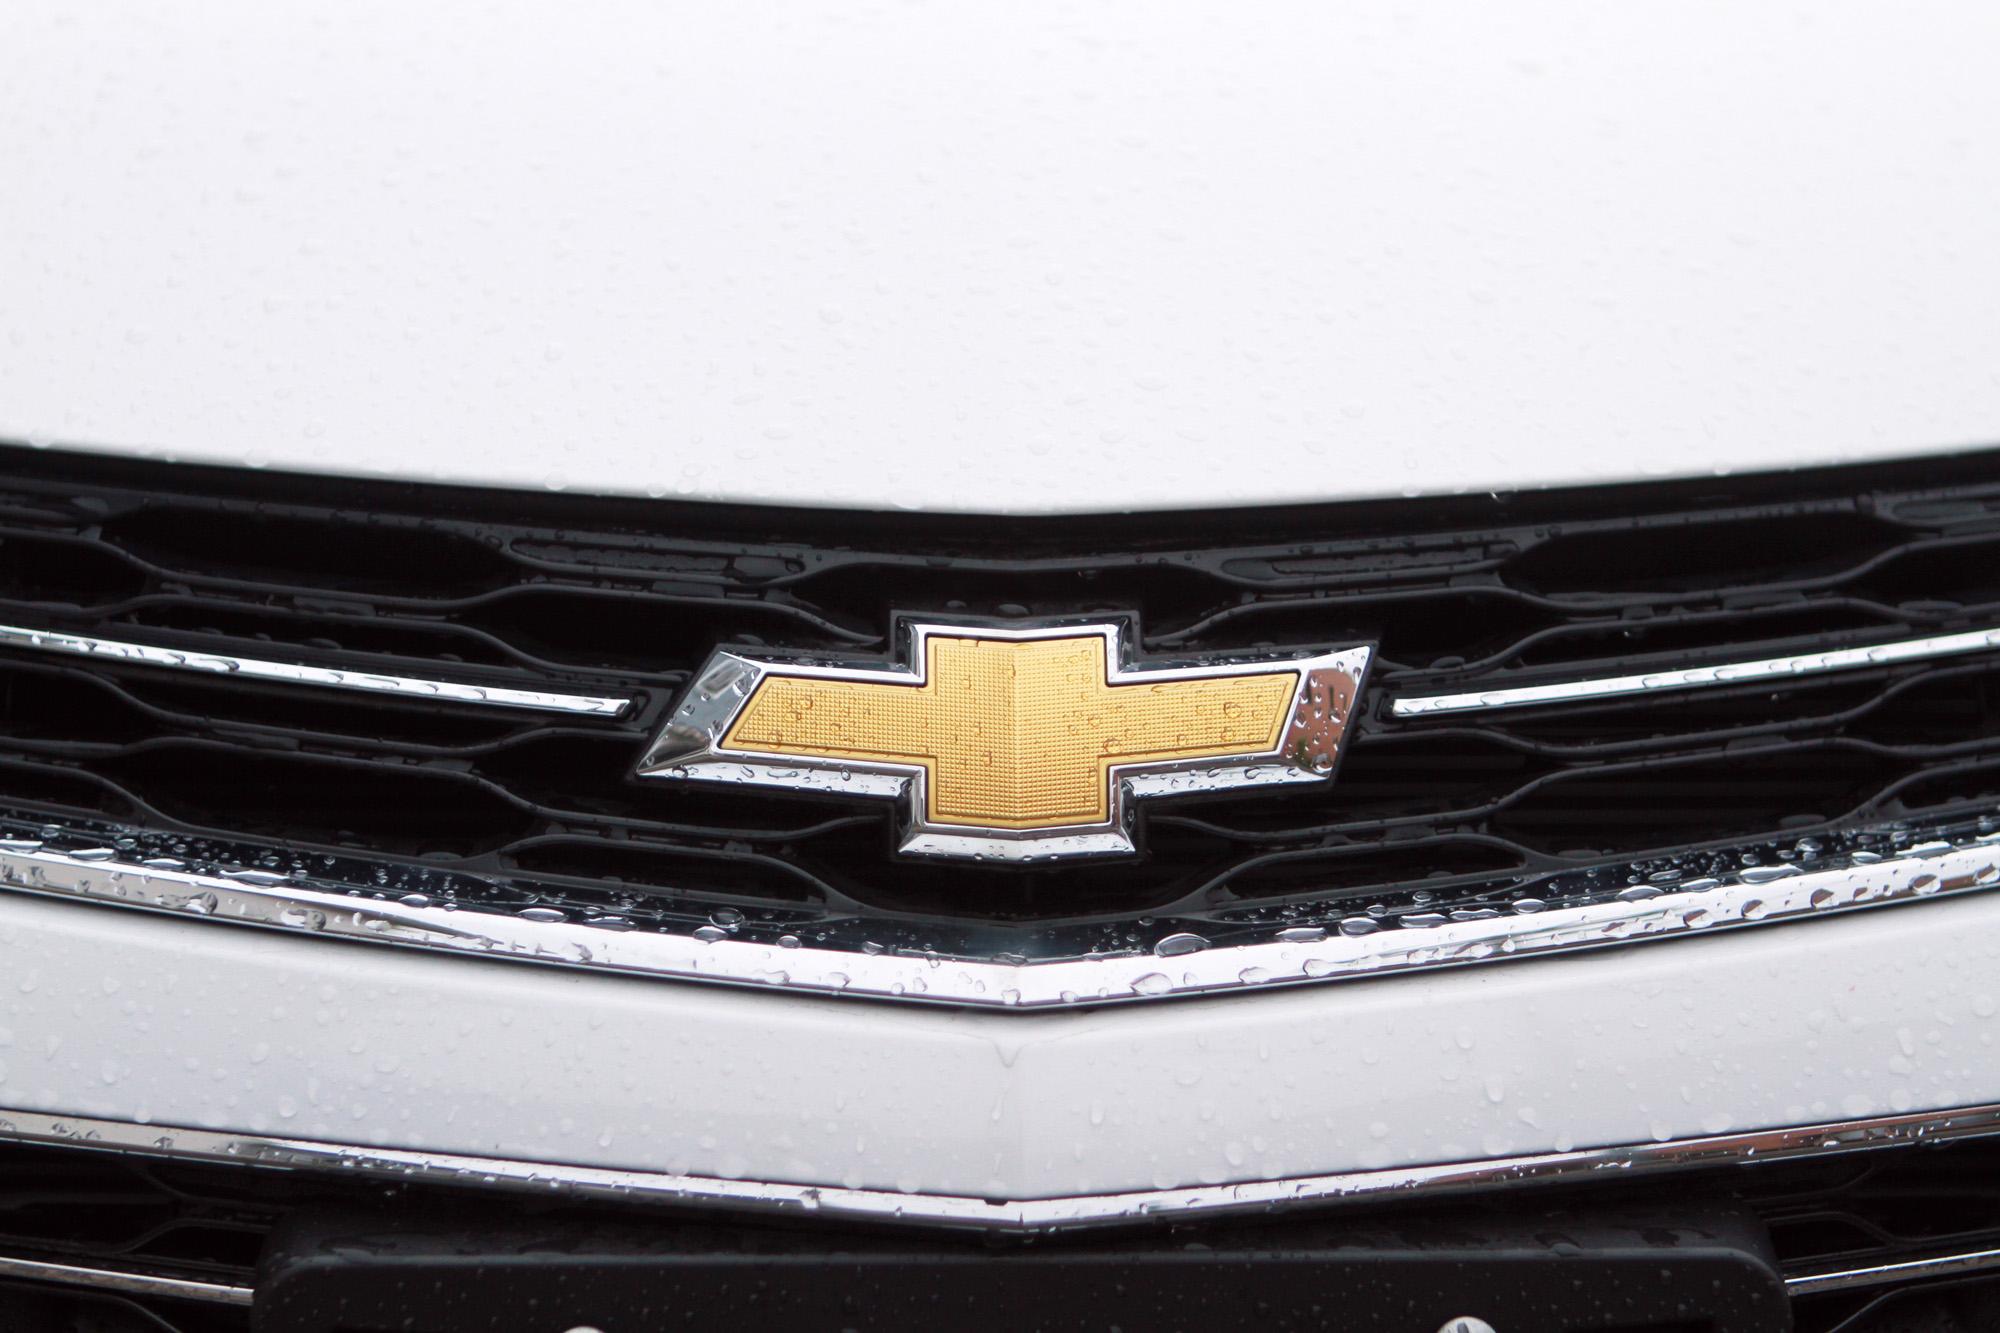 Chevrolet bowtie